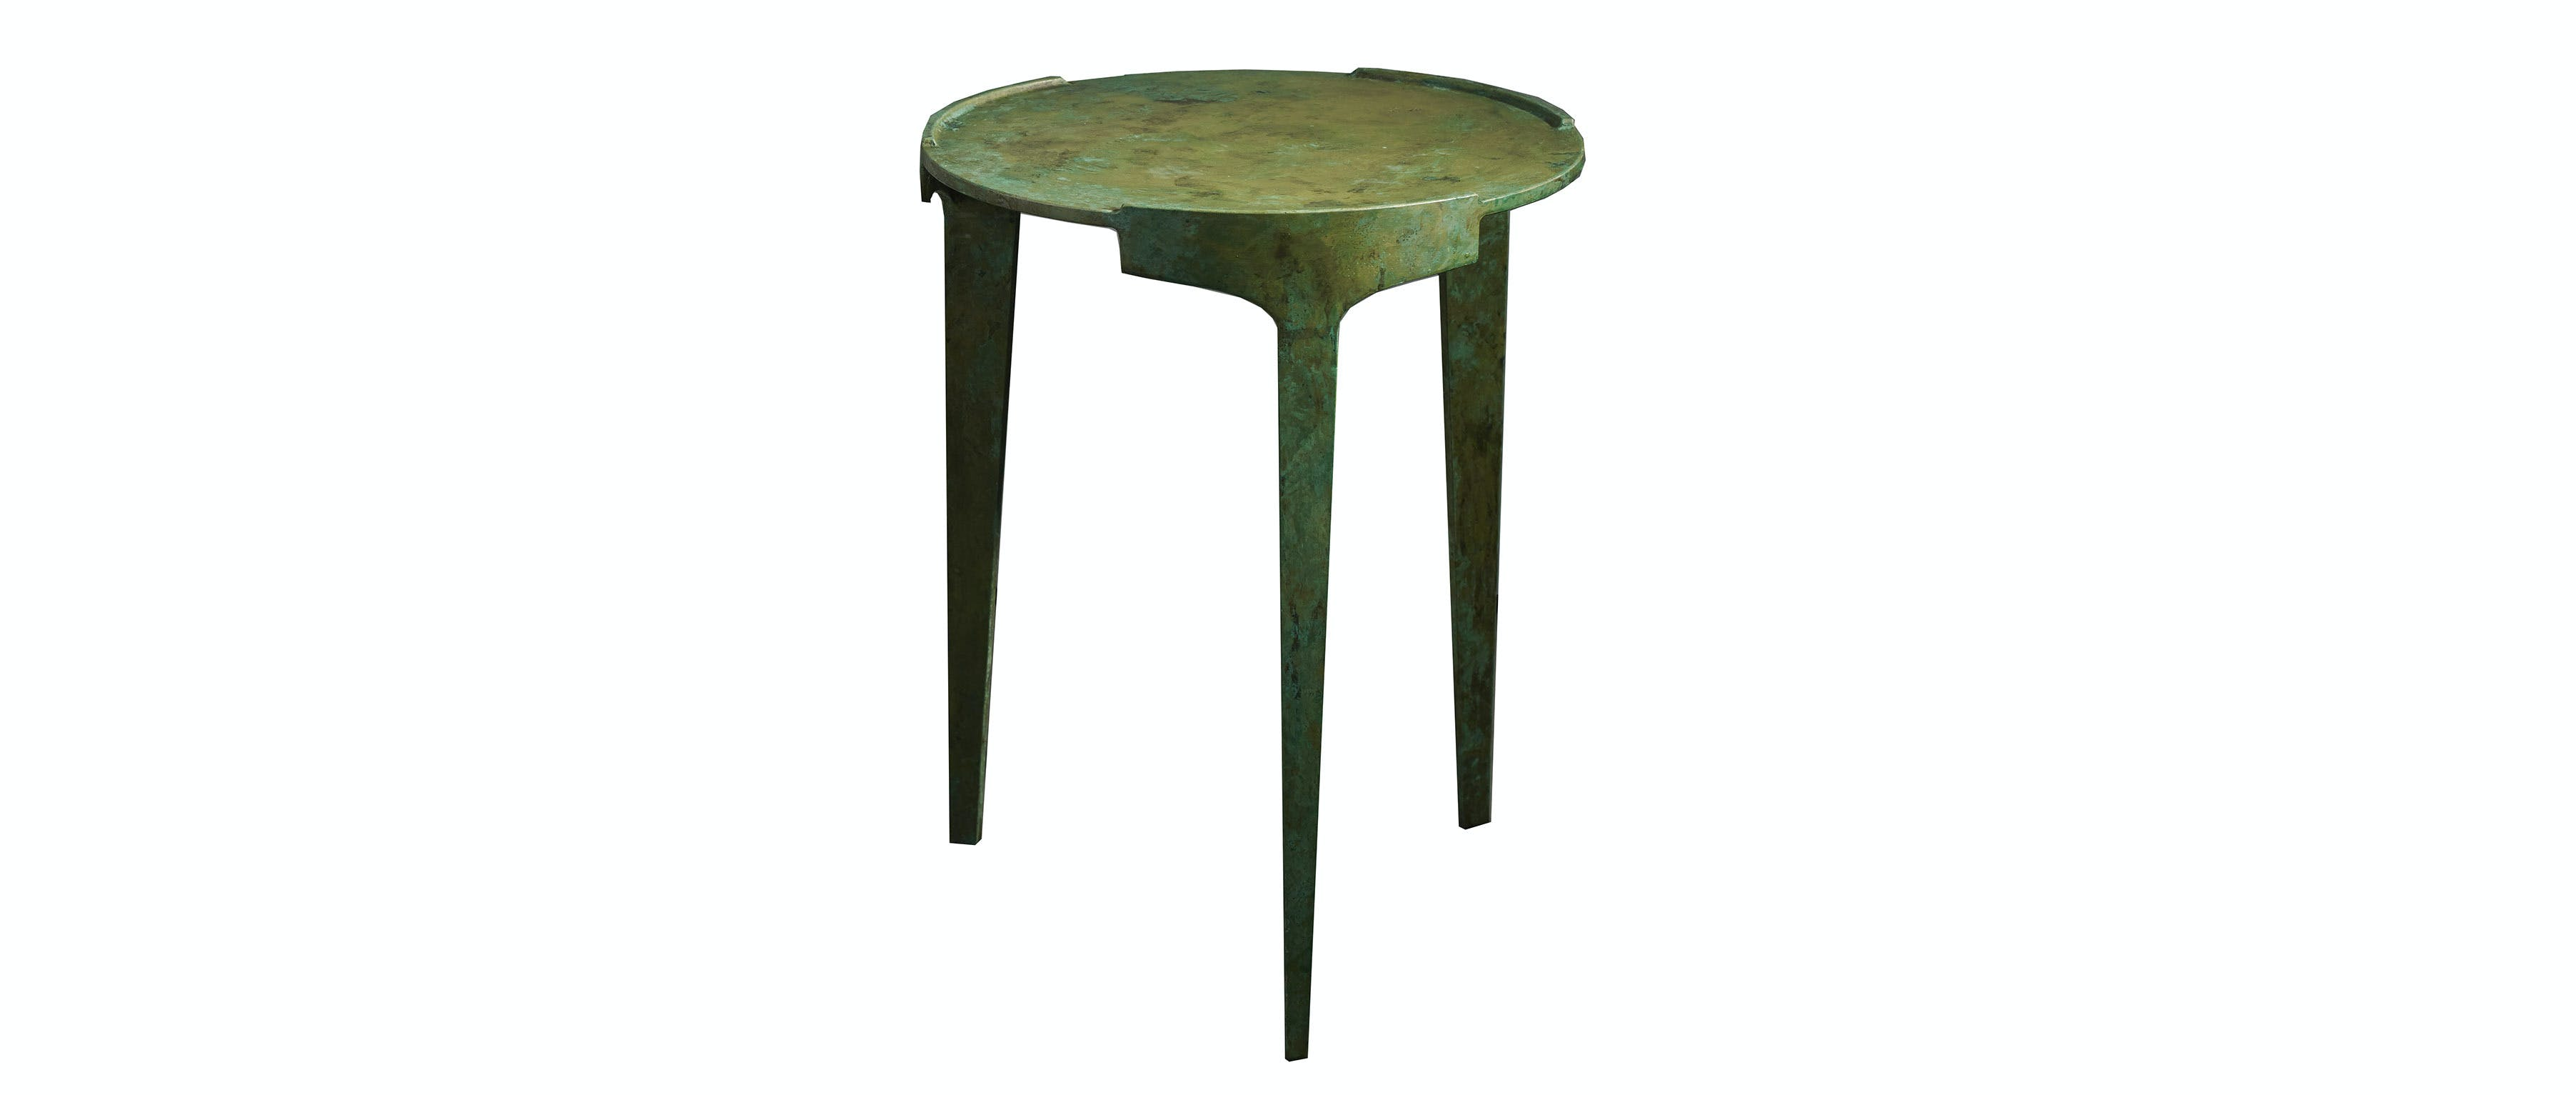 Hero Table Piet Boon 2 Hl